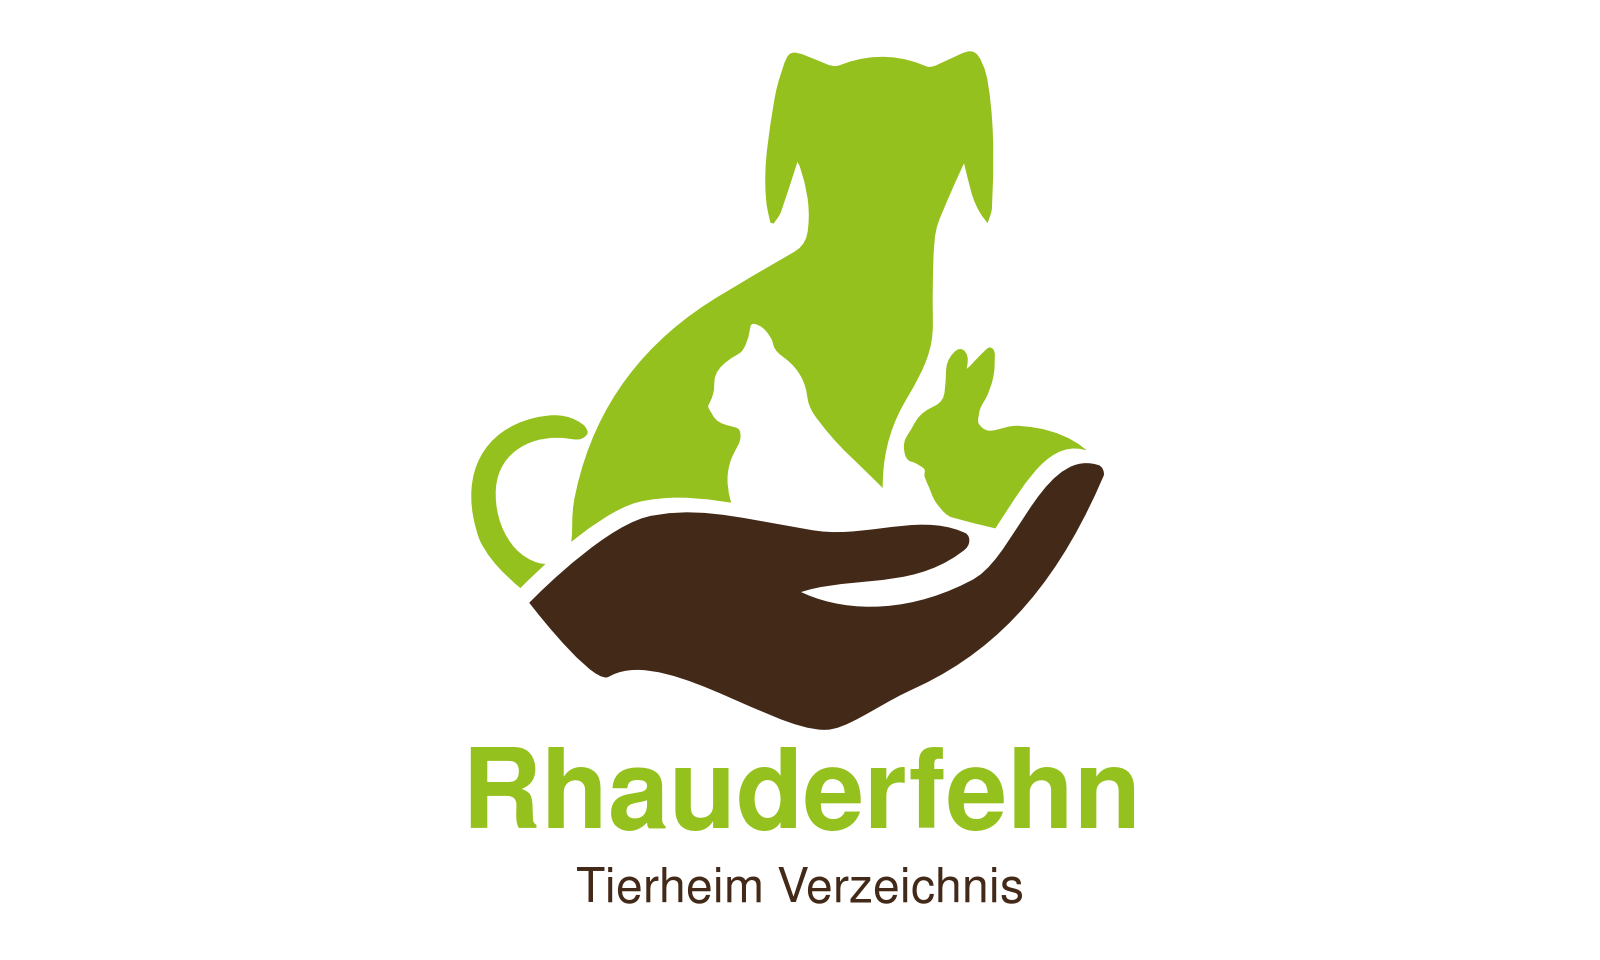 Tierheim Rhauderfehn